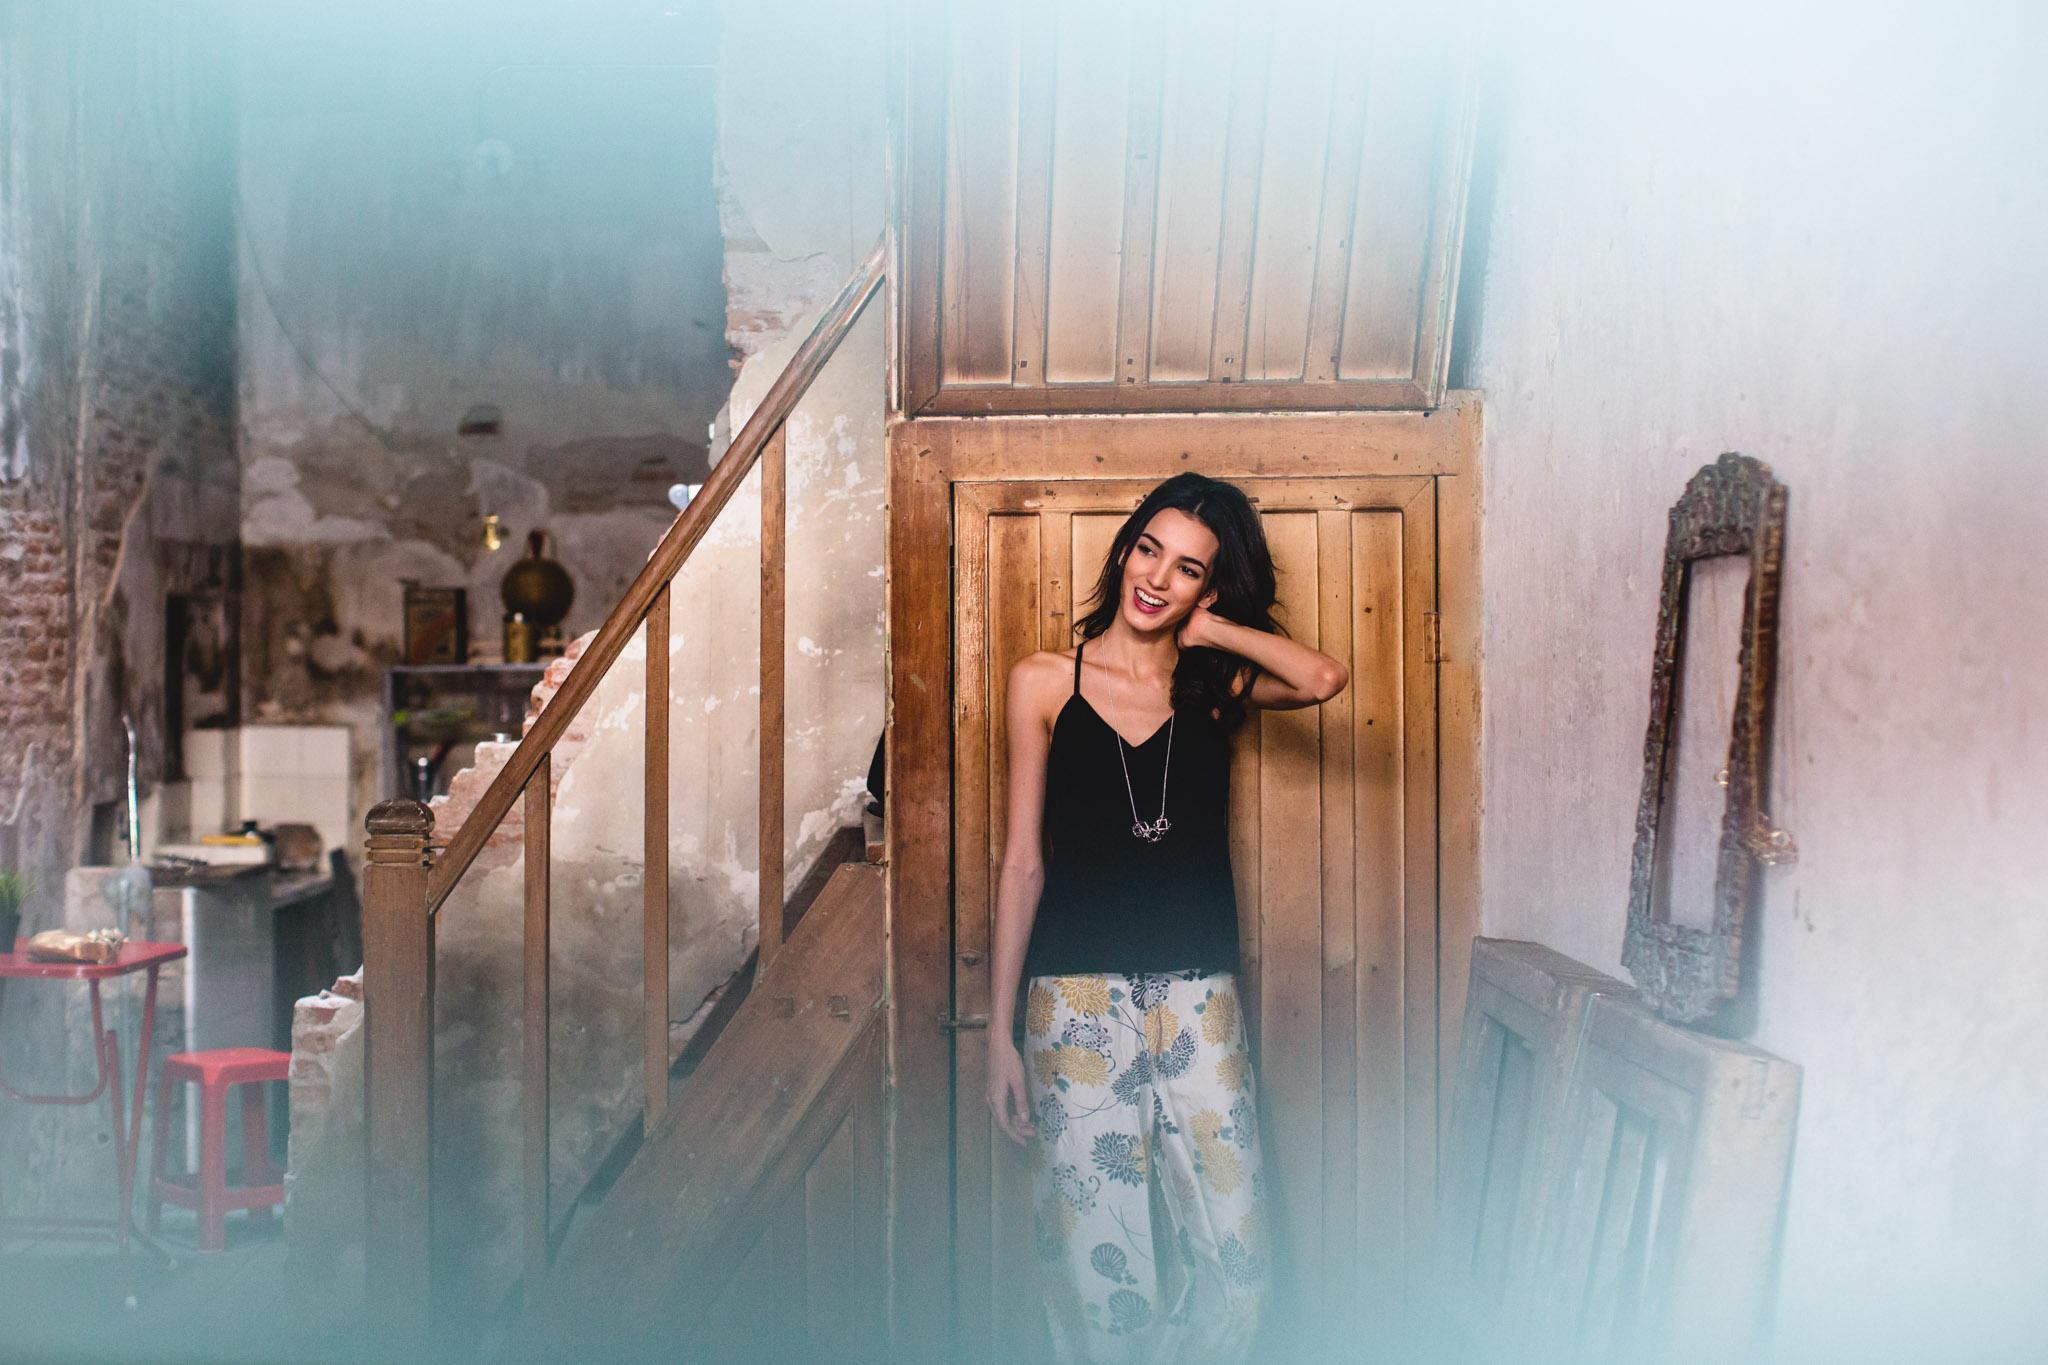 Isabelle_Day1_LR-16.jpg